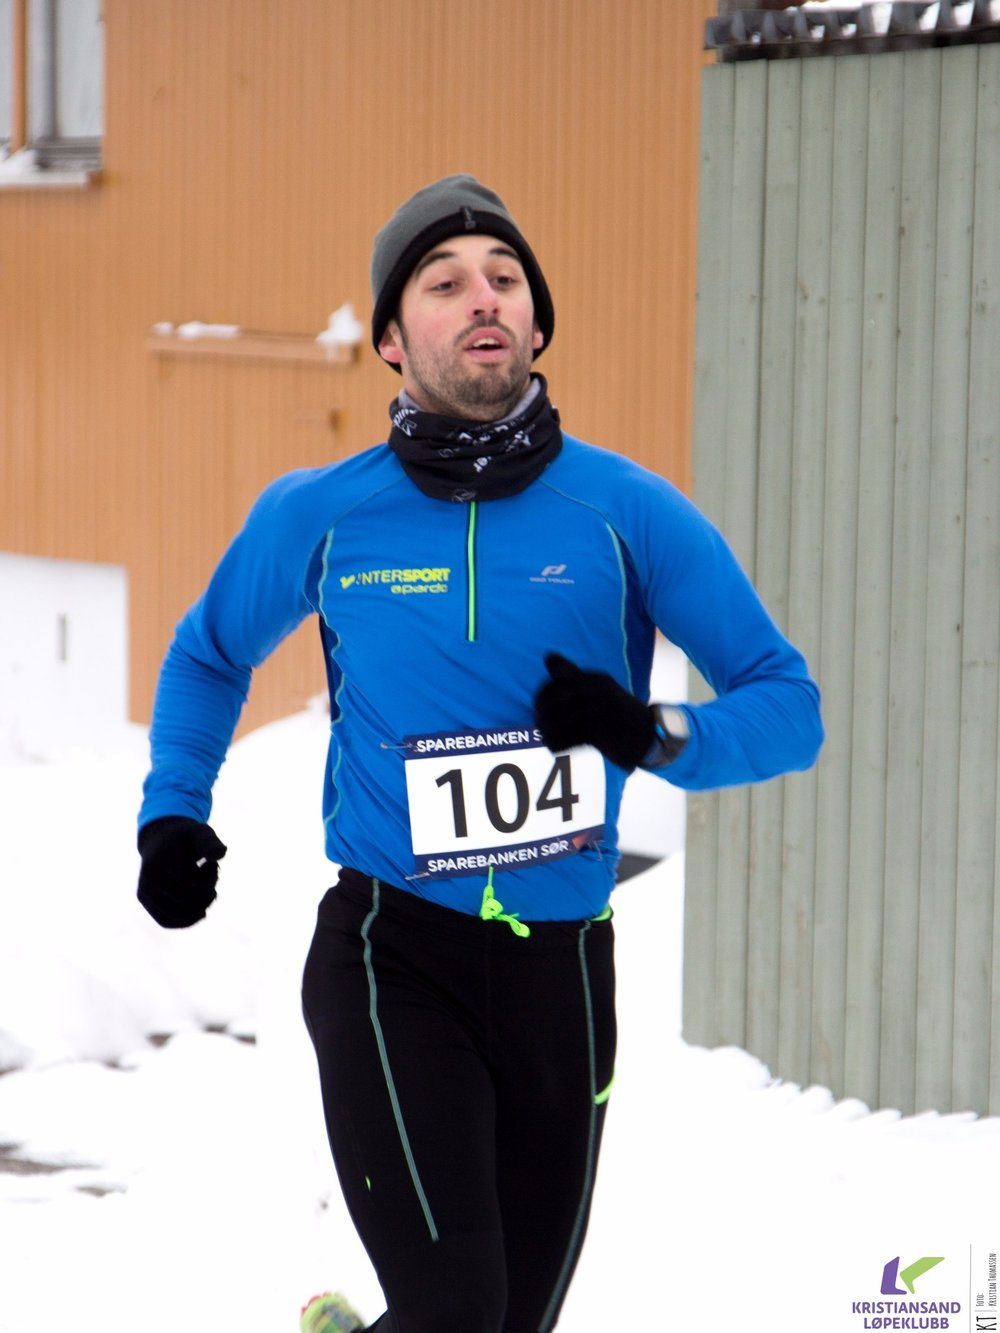 2017-02-11 Vinterkarusell-14.jpg